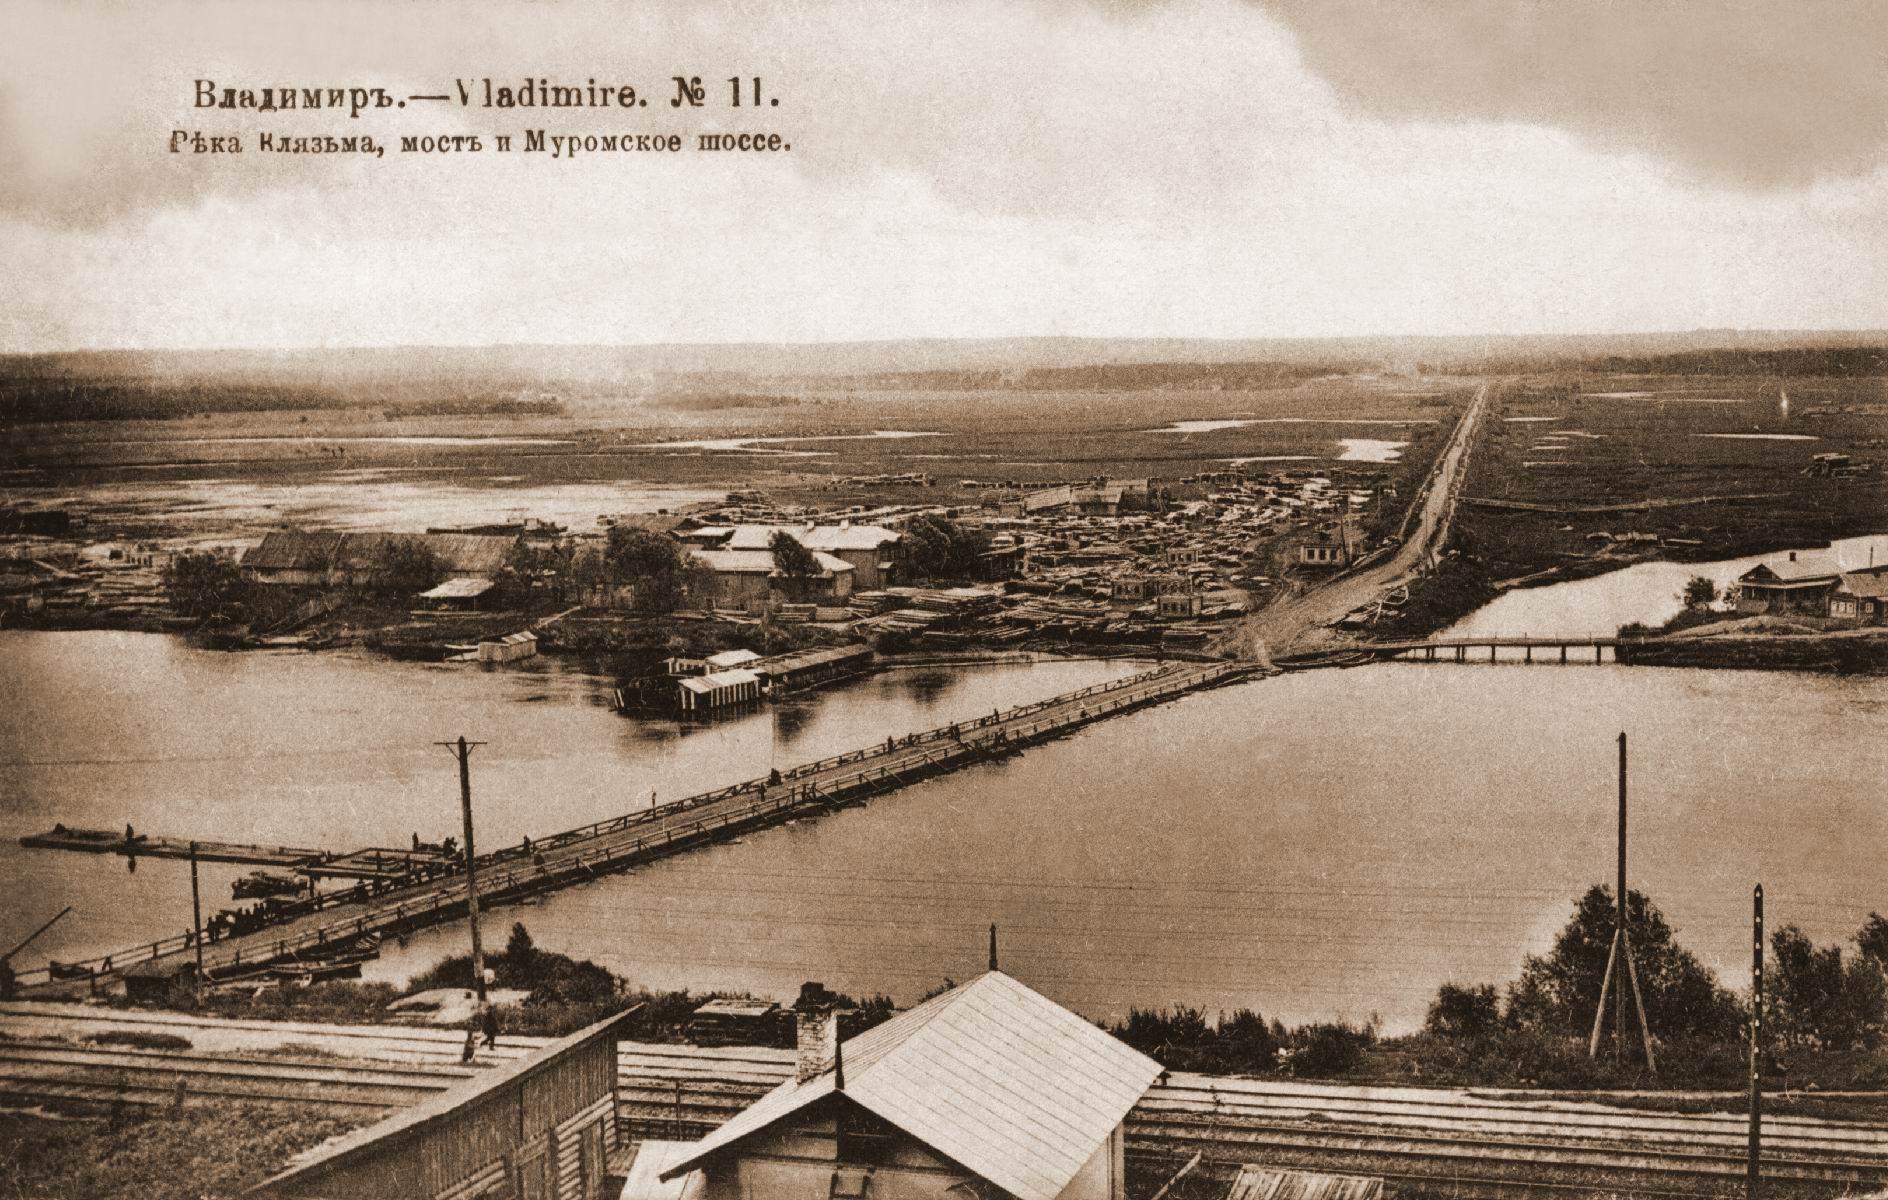 Река Клязьма, мост и Муромское шоссе